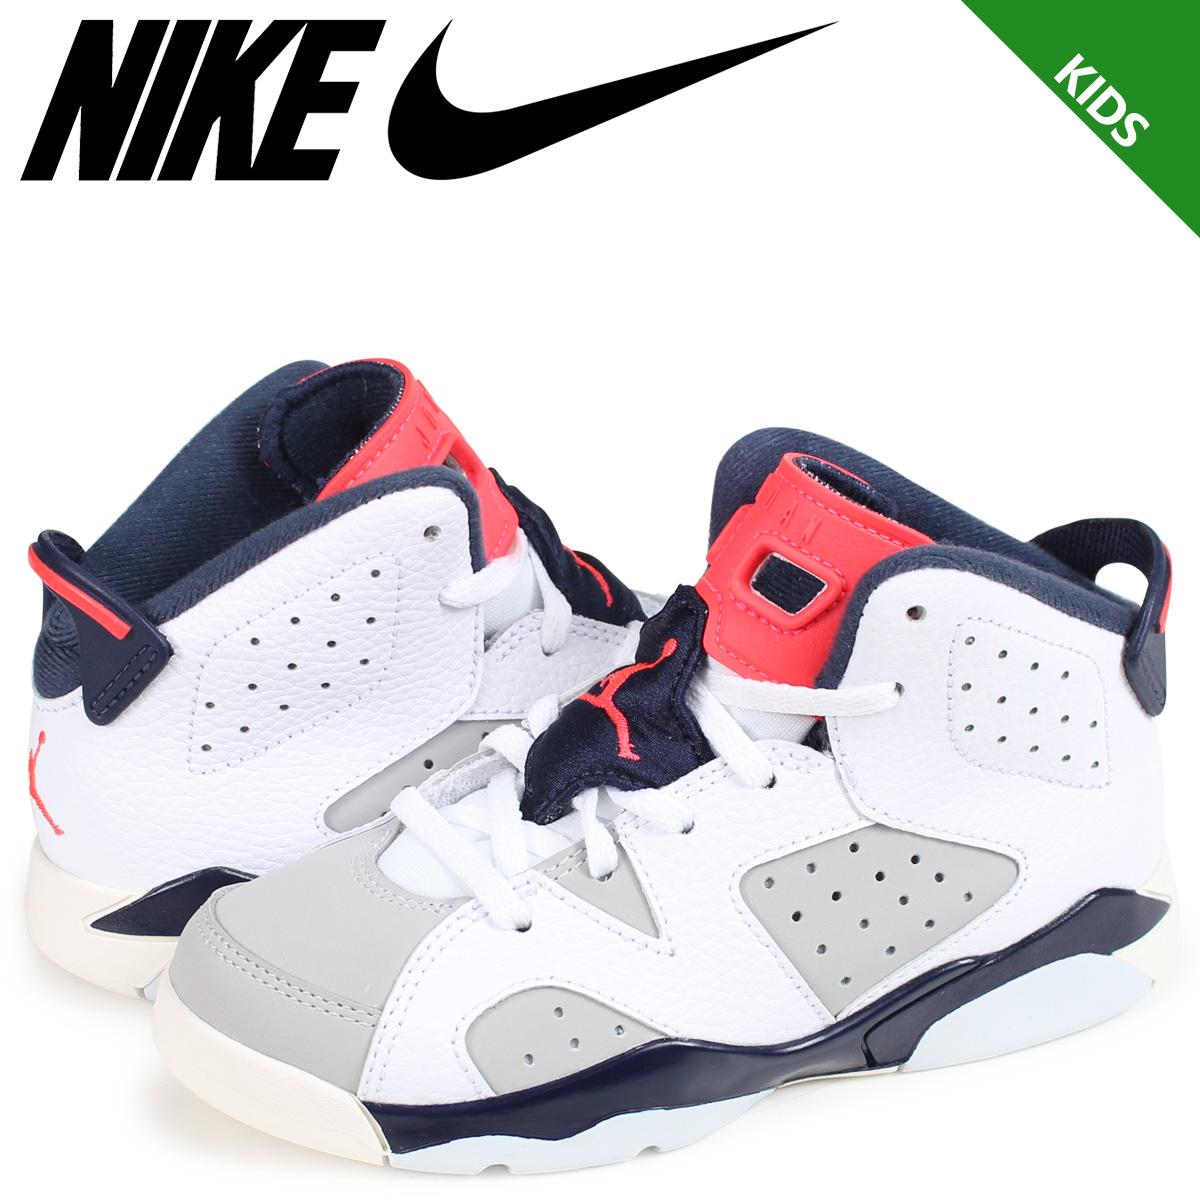 063119cc421a55 SneaK Online Shop: NIKE AIR JORDAN 6 RETRO PS TINKER Nike Air Jordan ...